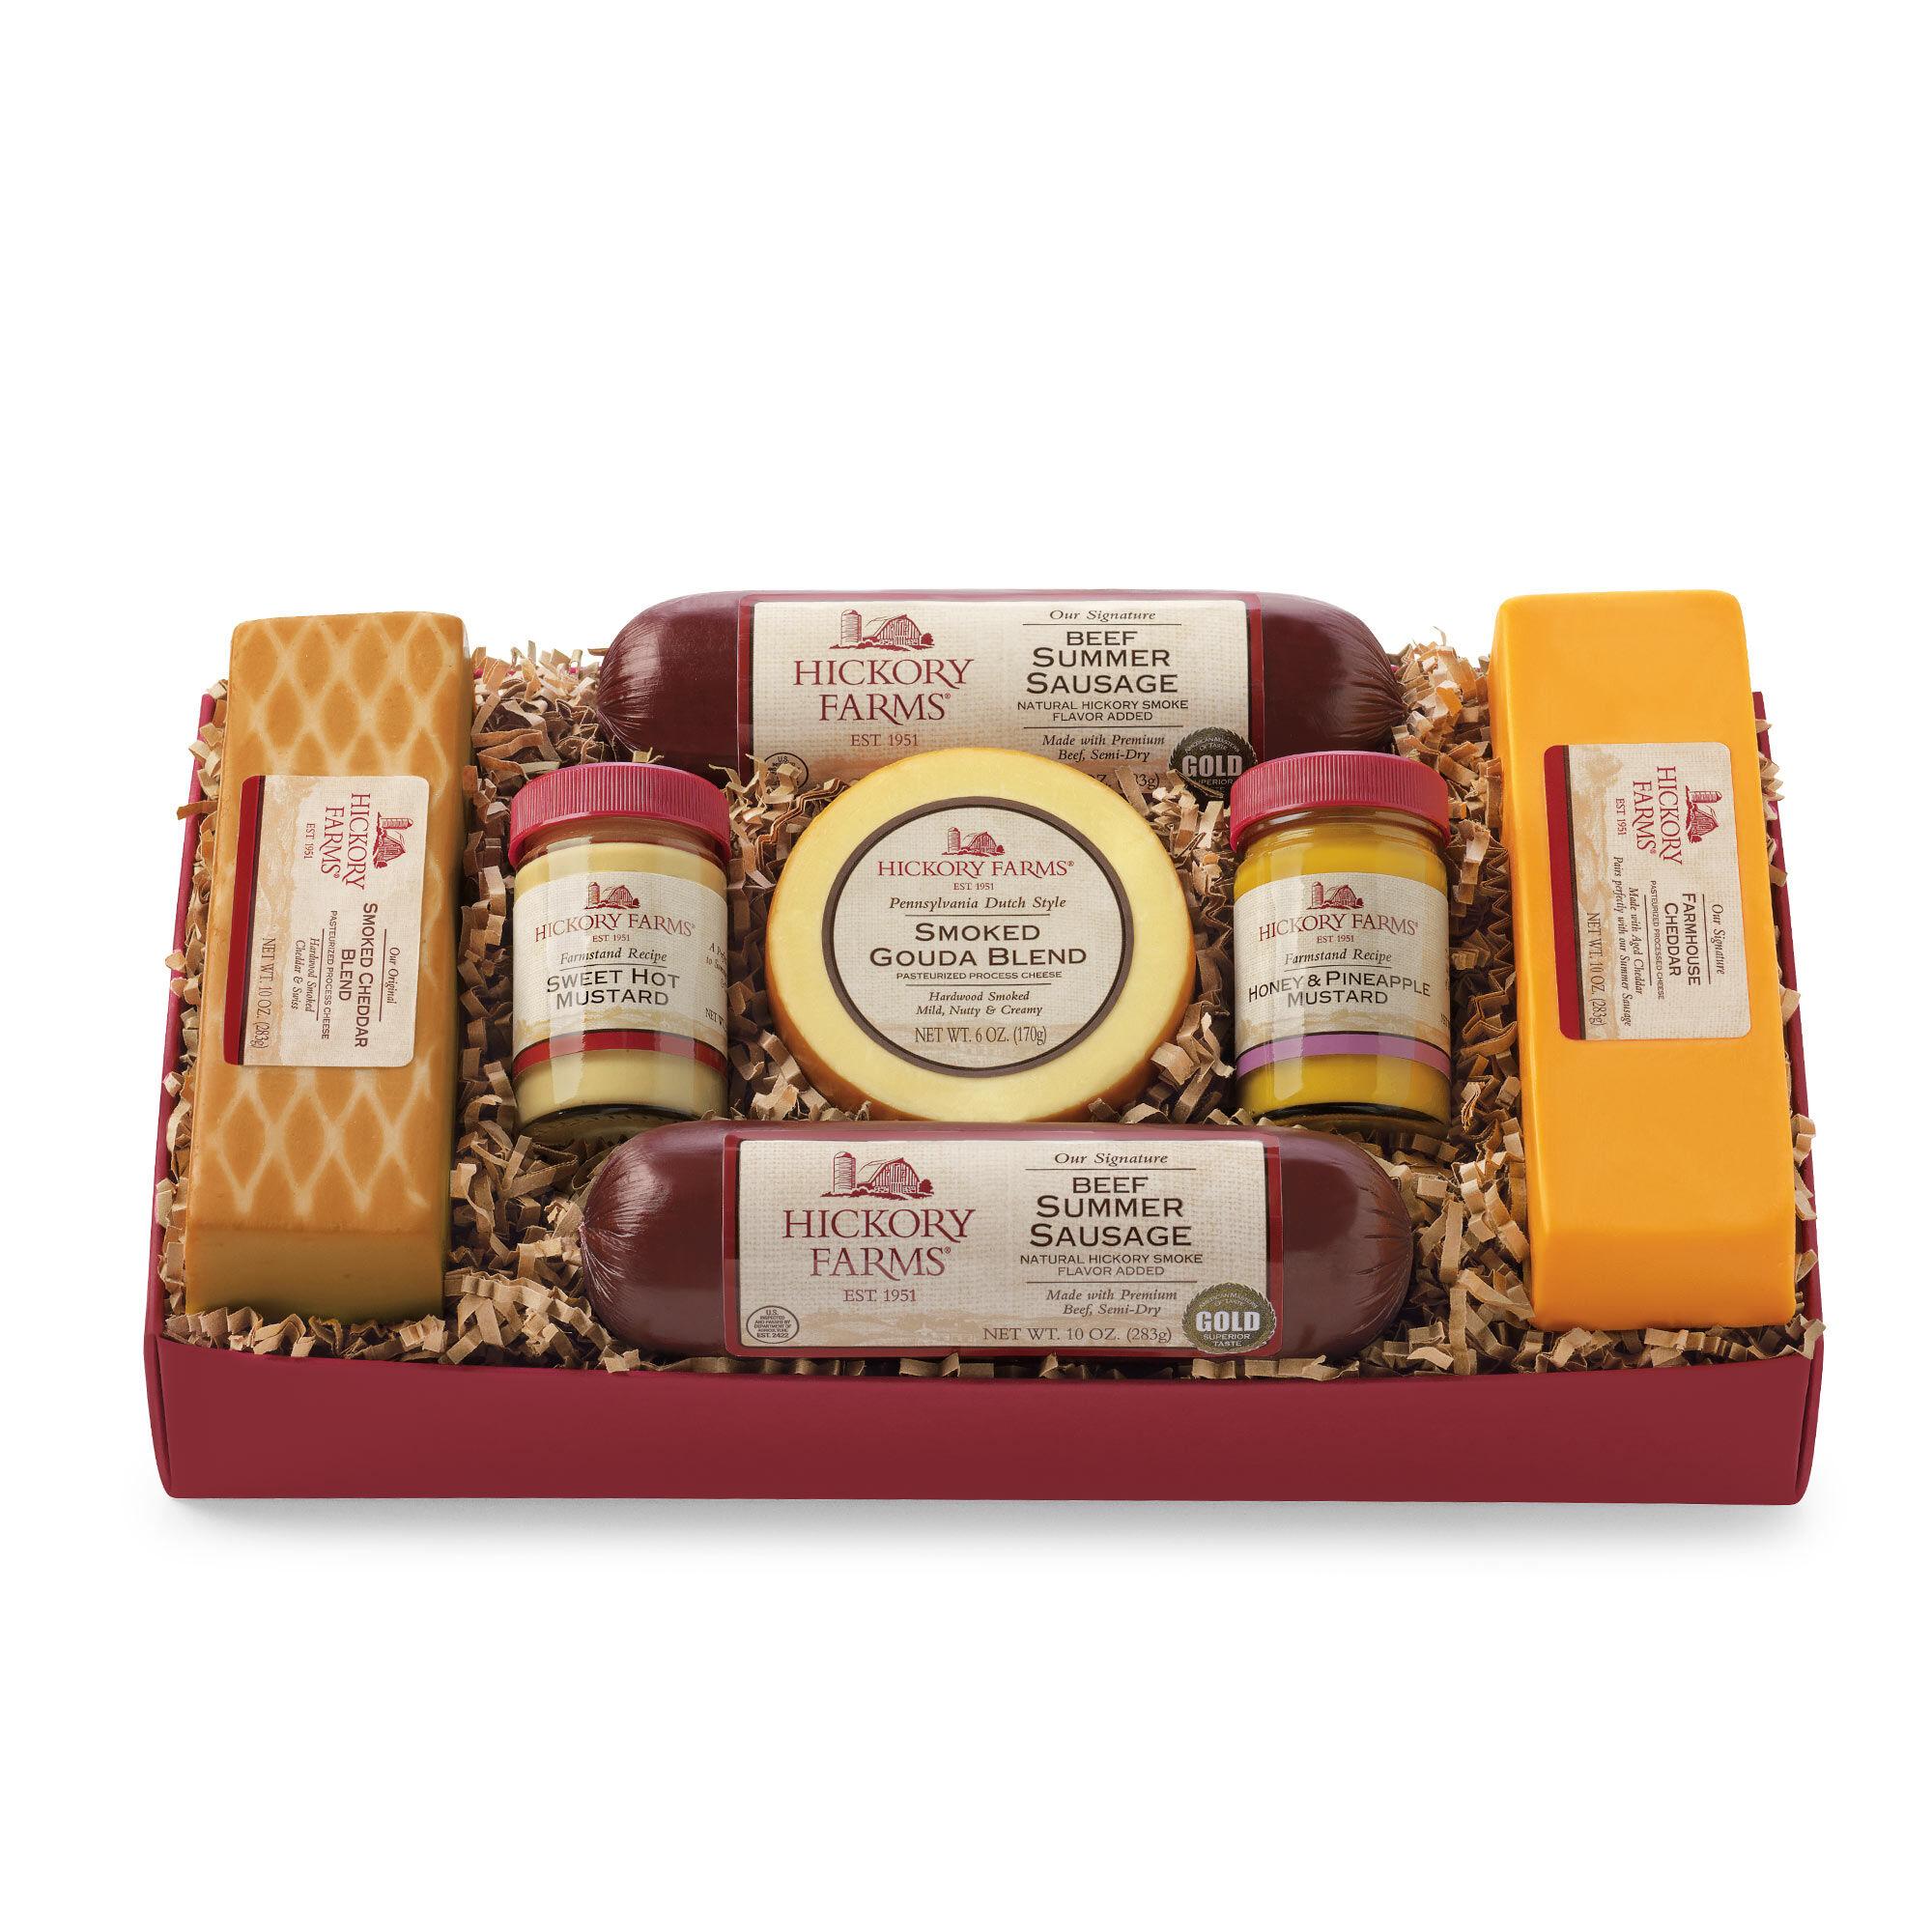 christmas gift baskets free shipping unihack - Christmas Gift Baskets Free Shipping